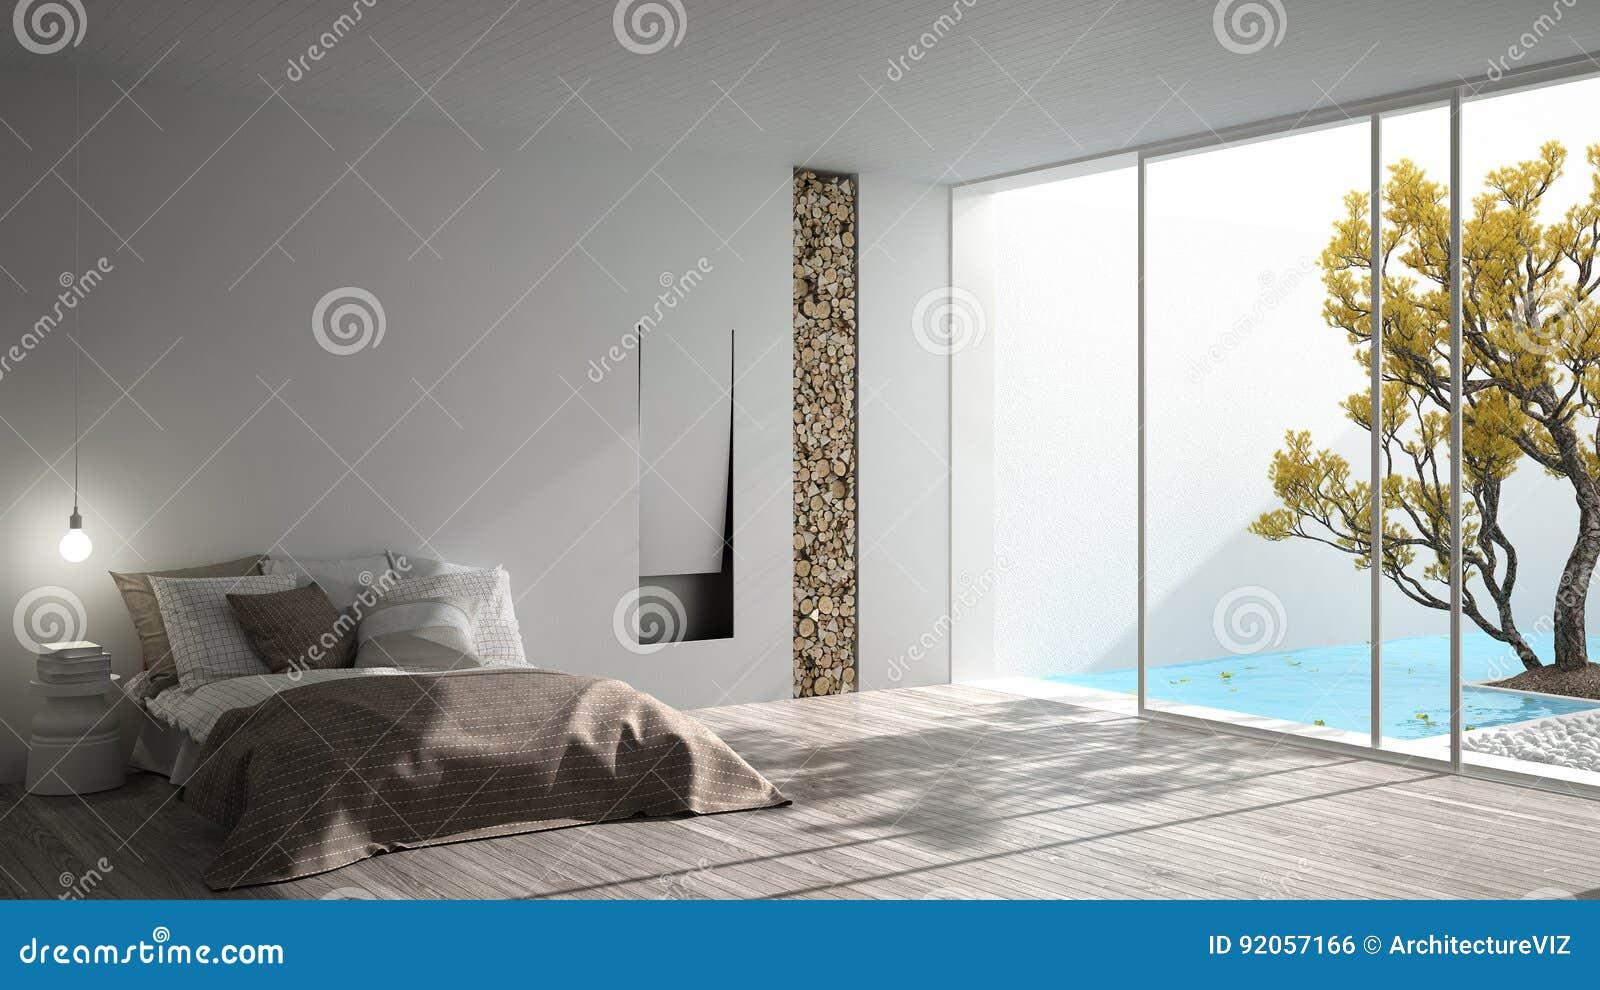 minimalist modern bedroom with big window showing garden and swi